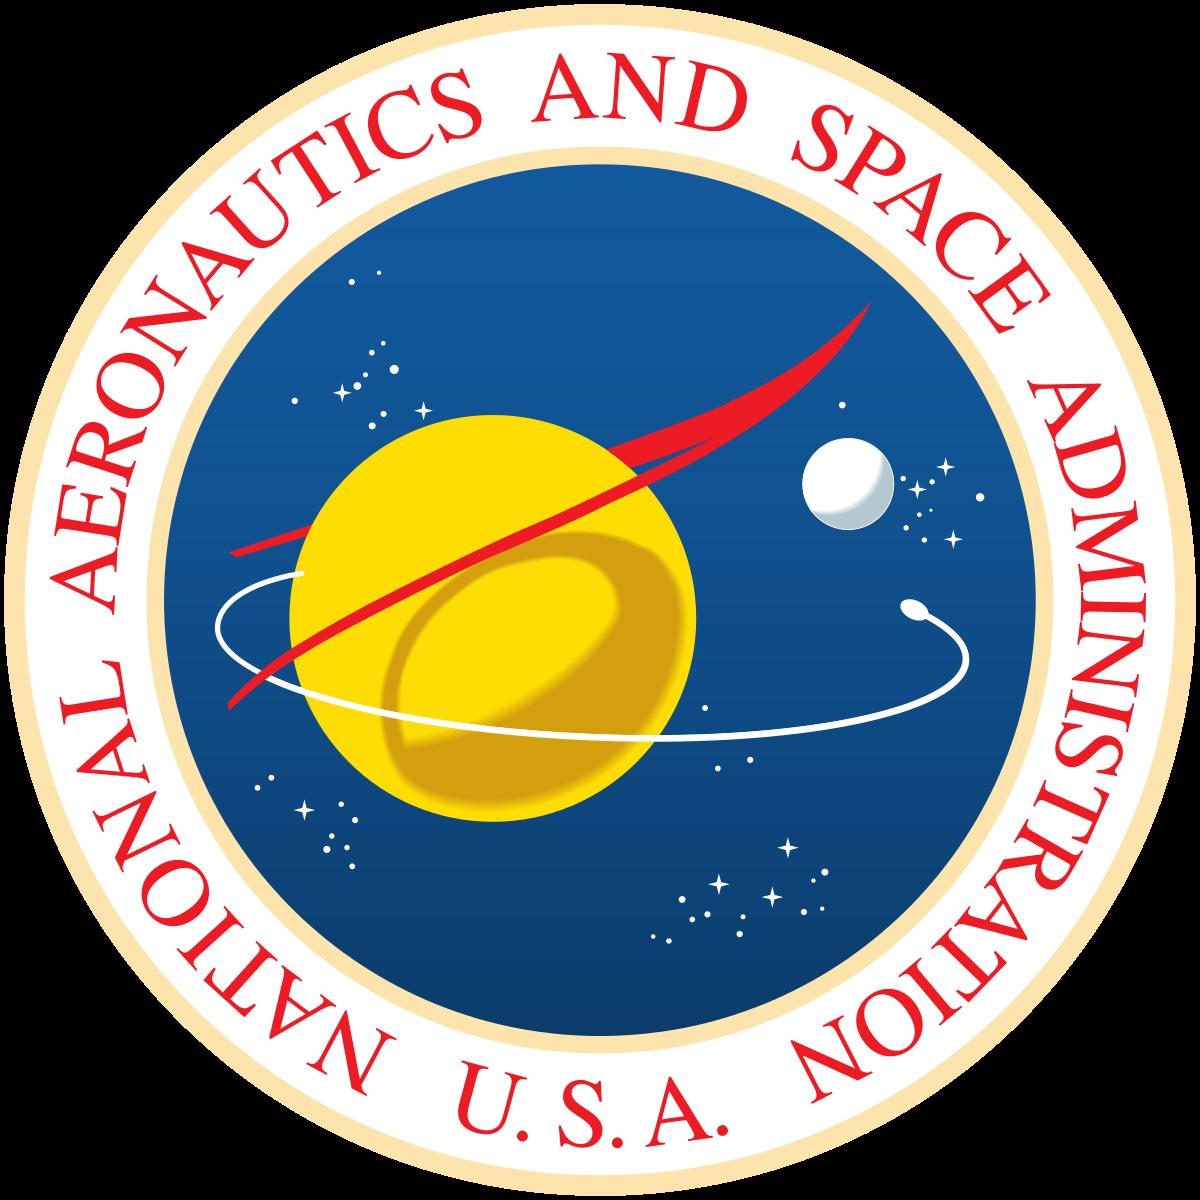 sursa imaginii https://en.wikipedia.org/wiki/NASA